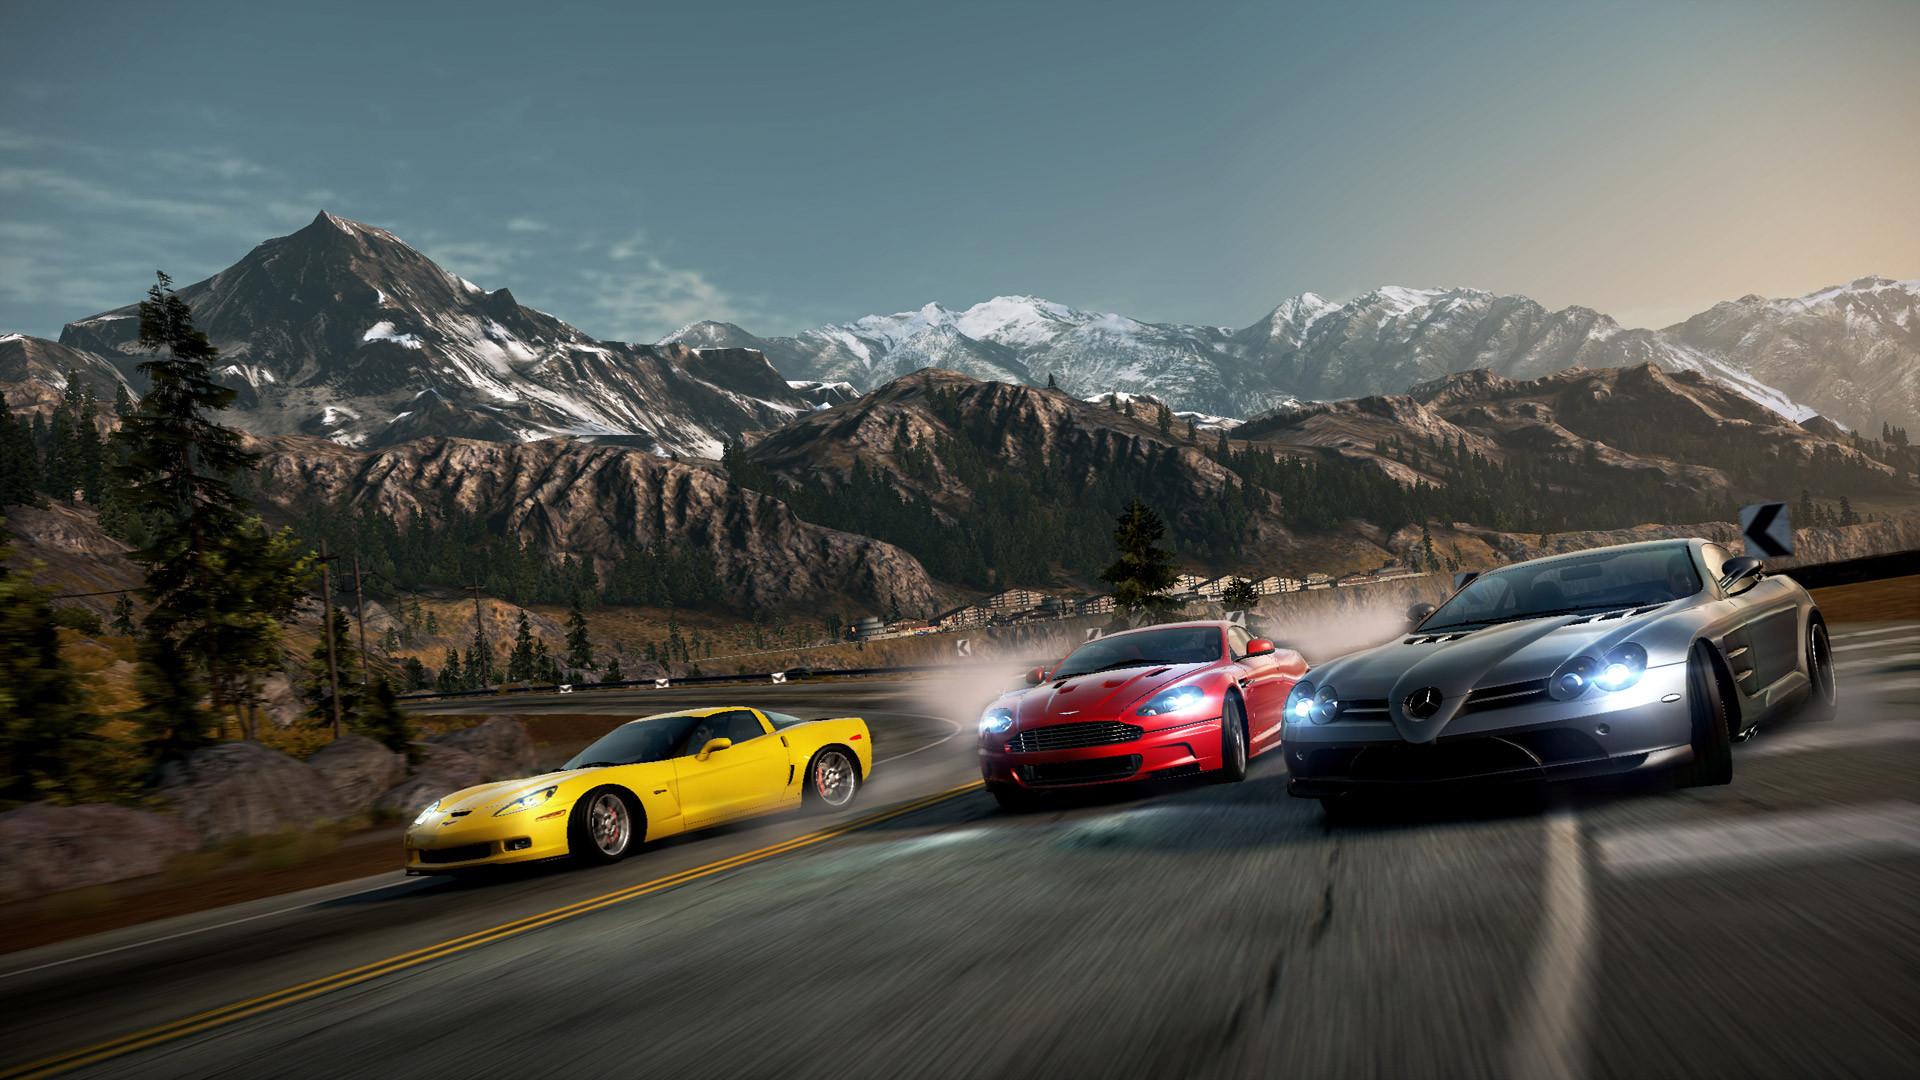 اکانت اشتراکی بازی Need For Speed Hot Pursuit Remastered